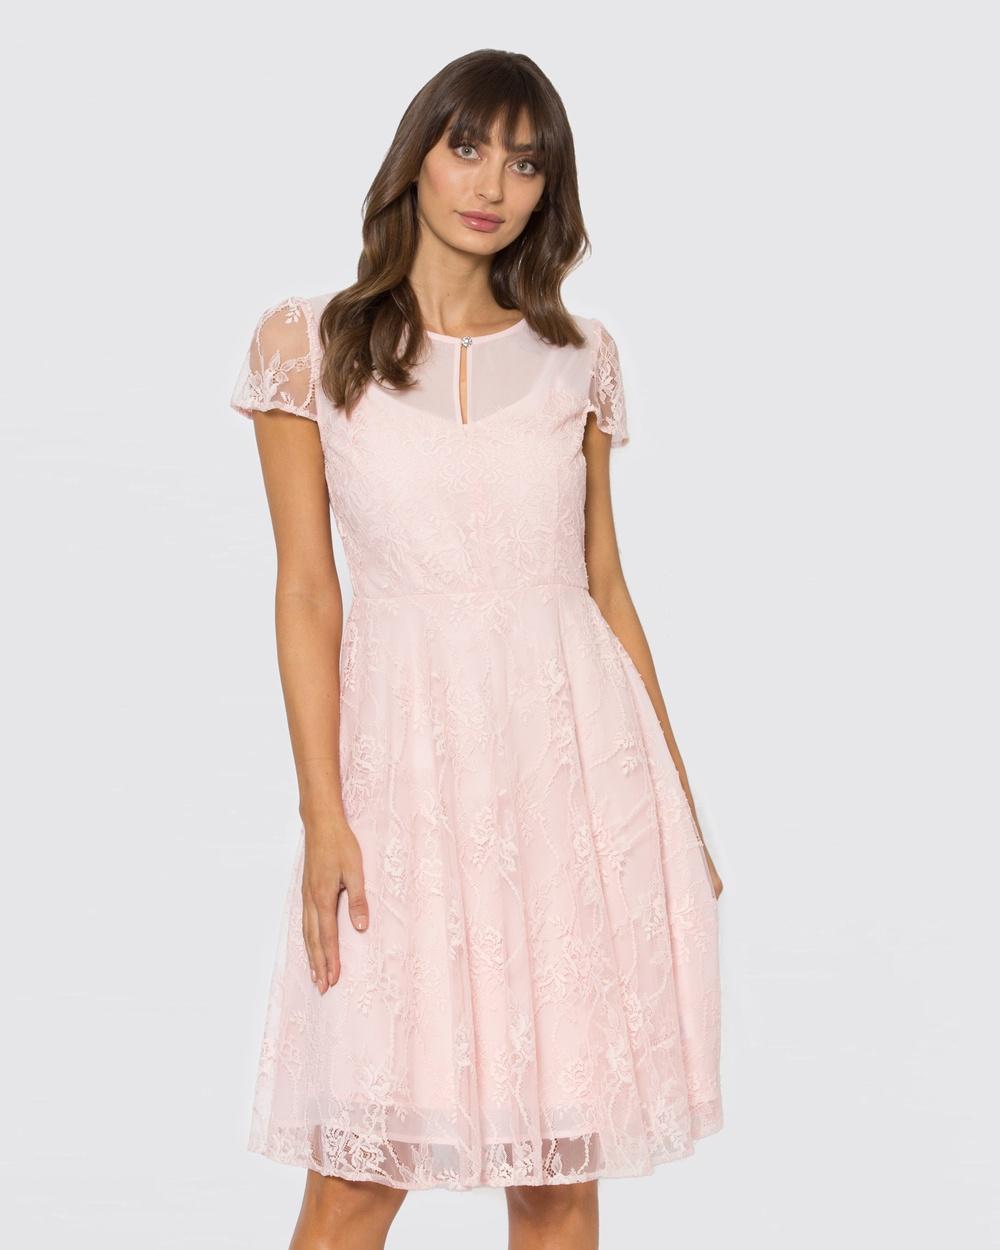 Alannah Hill Pink Mullholland Dress